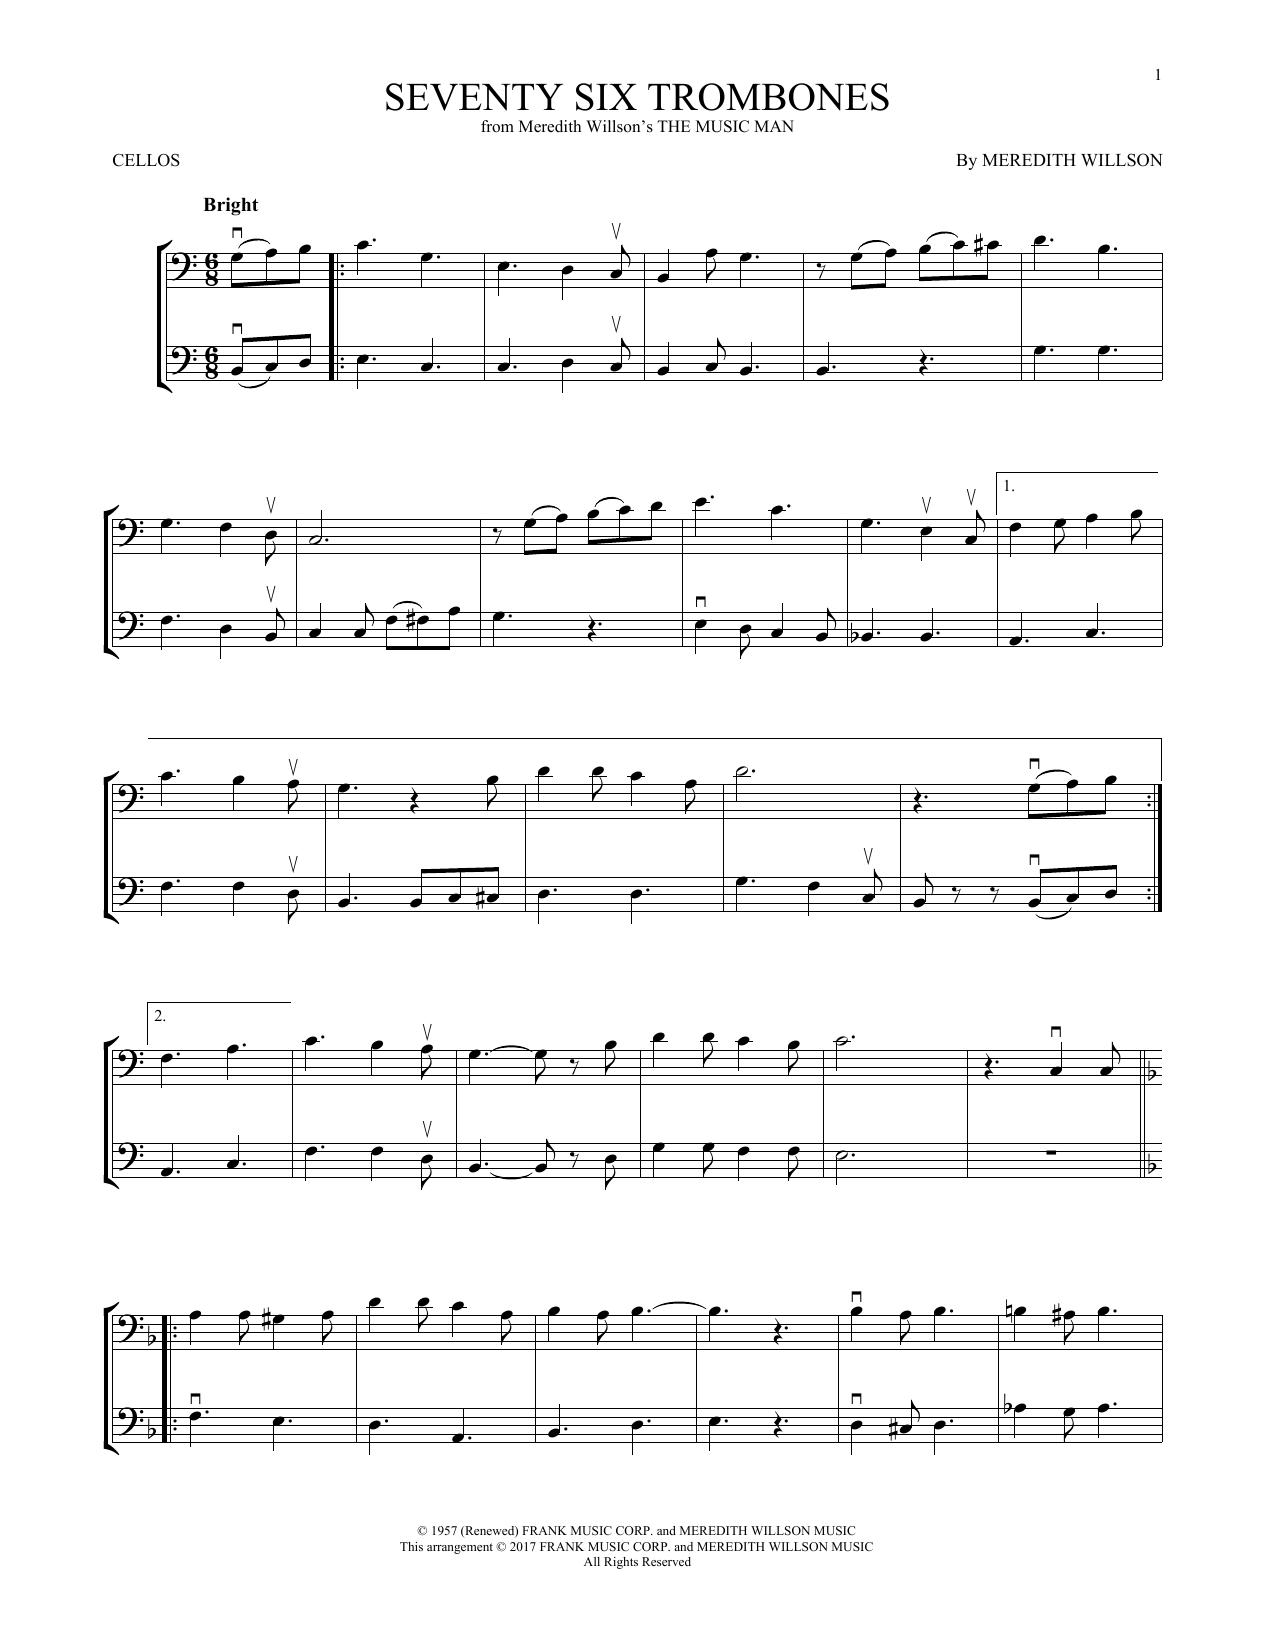 Seventy Six Trombones (from The Music Man) (Cello Duet)